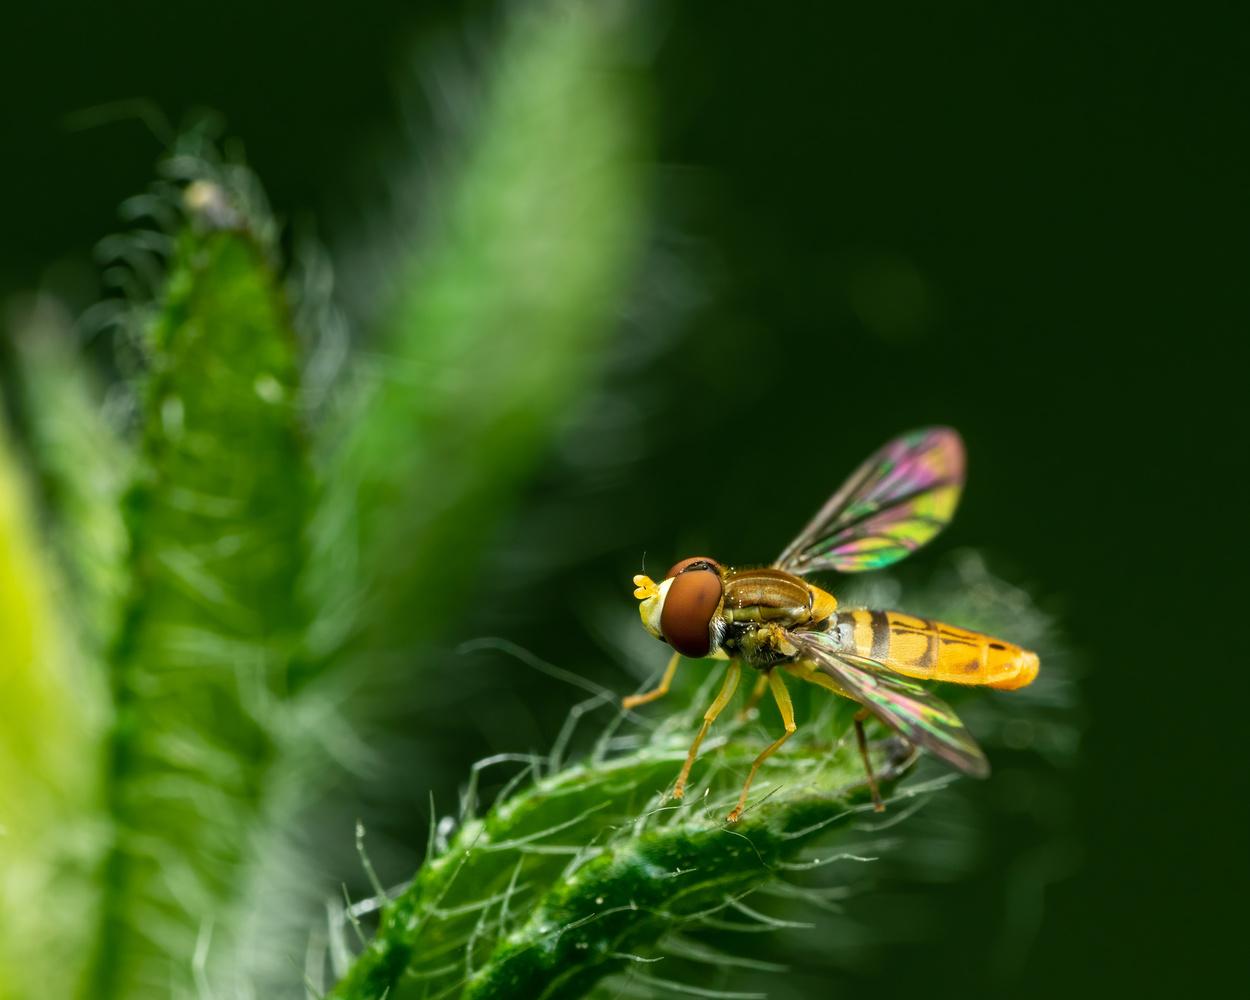 Fly by Skyler Ewing